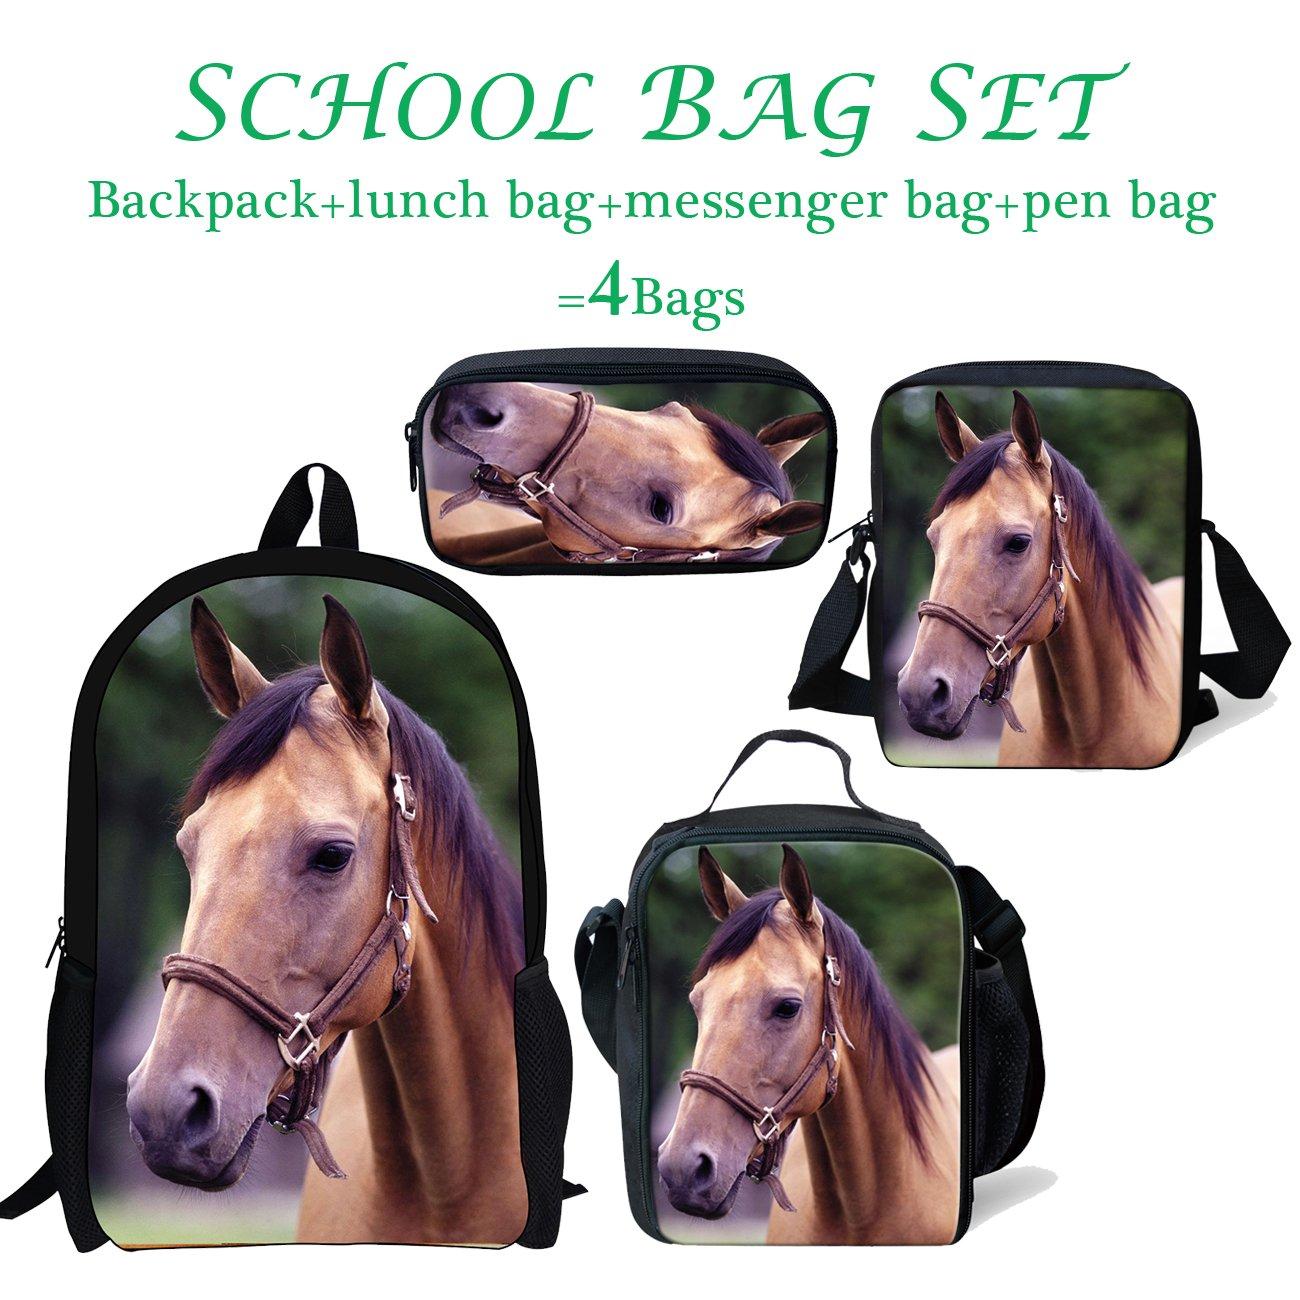 thikin便利ポータブルキッズランチバッグ絶縁熱食品バッグボックス調節可能なストラップ付きGalaxy Starかわいい猫パターン 17 inch ブルー B07FQP1G96 4 Kids School Bags Set #11